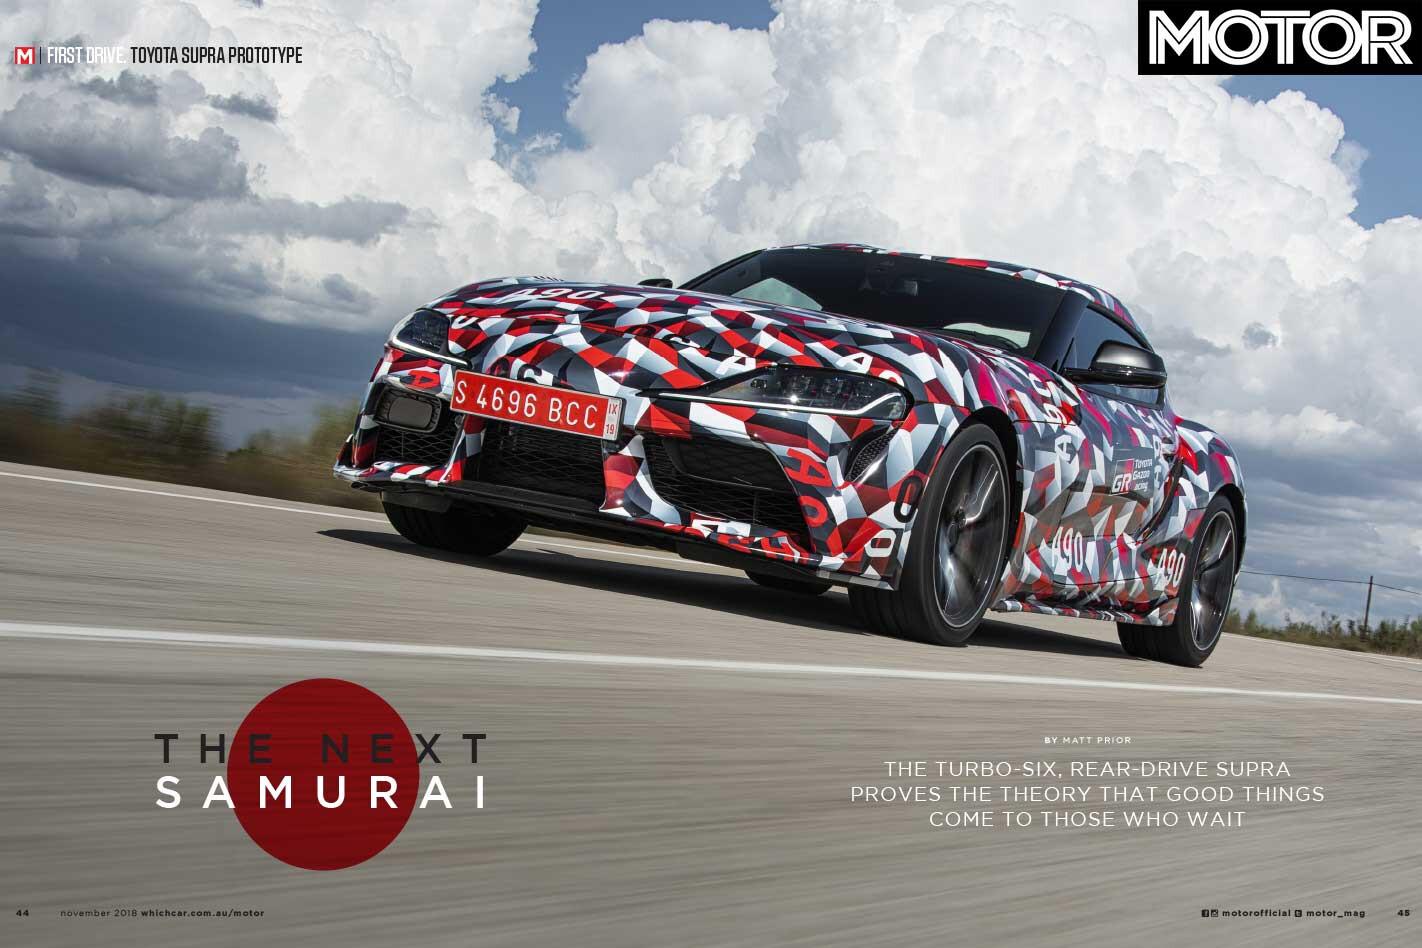 MOTOR Magazine November 2018 Toyota Supra Jpg